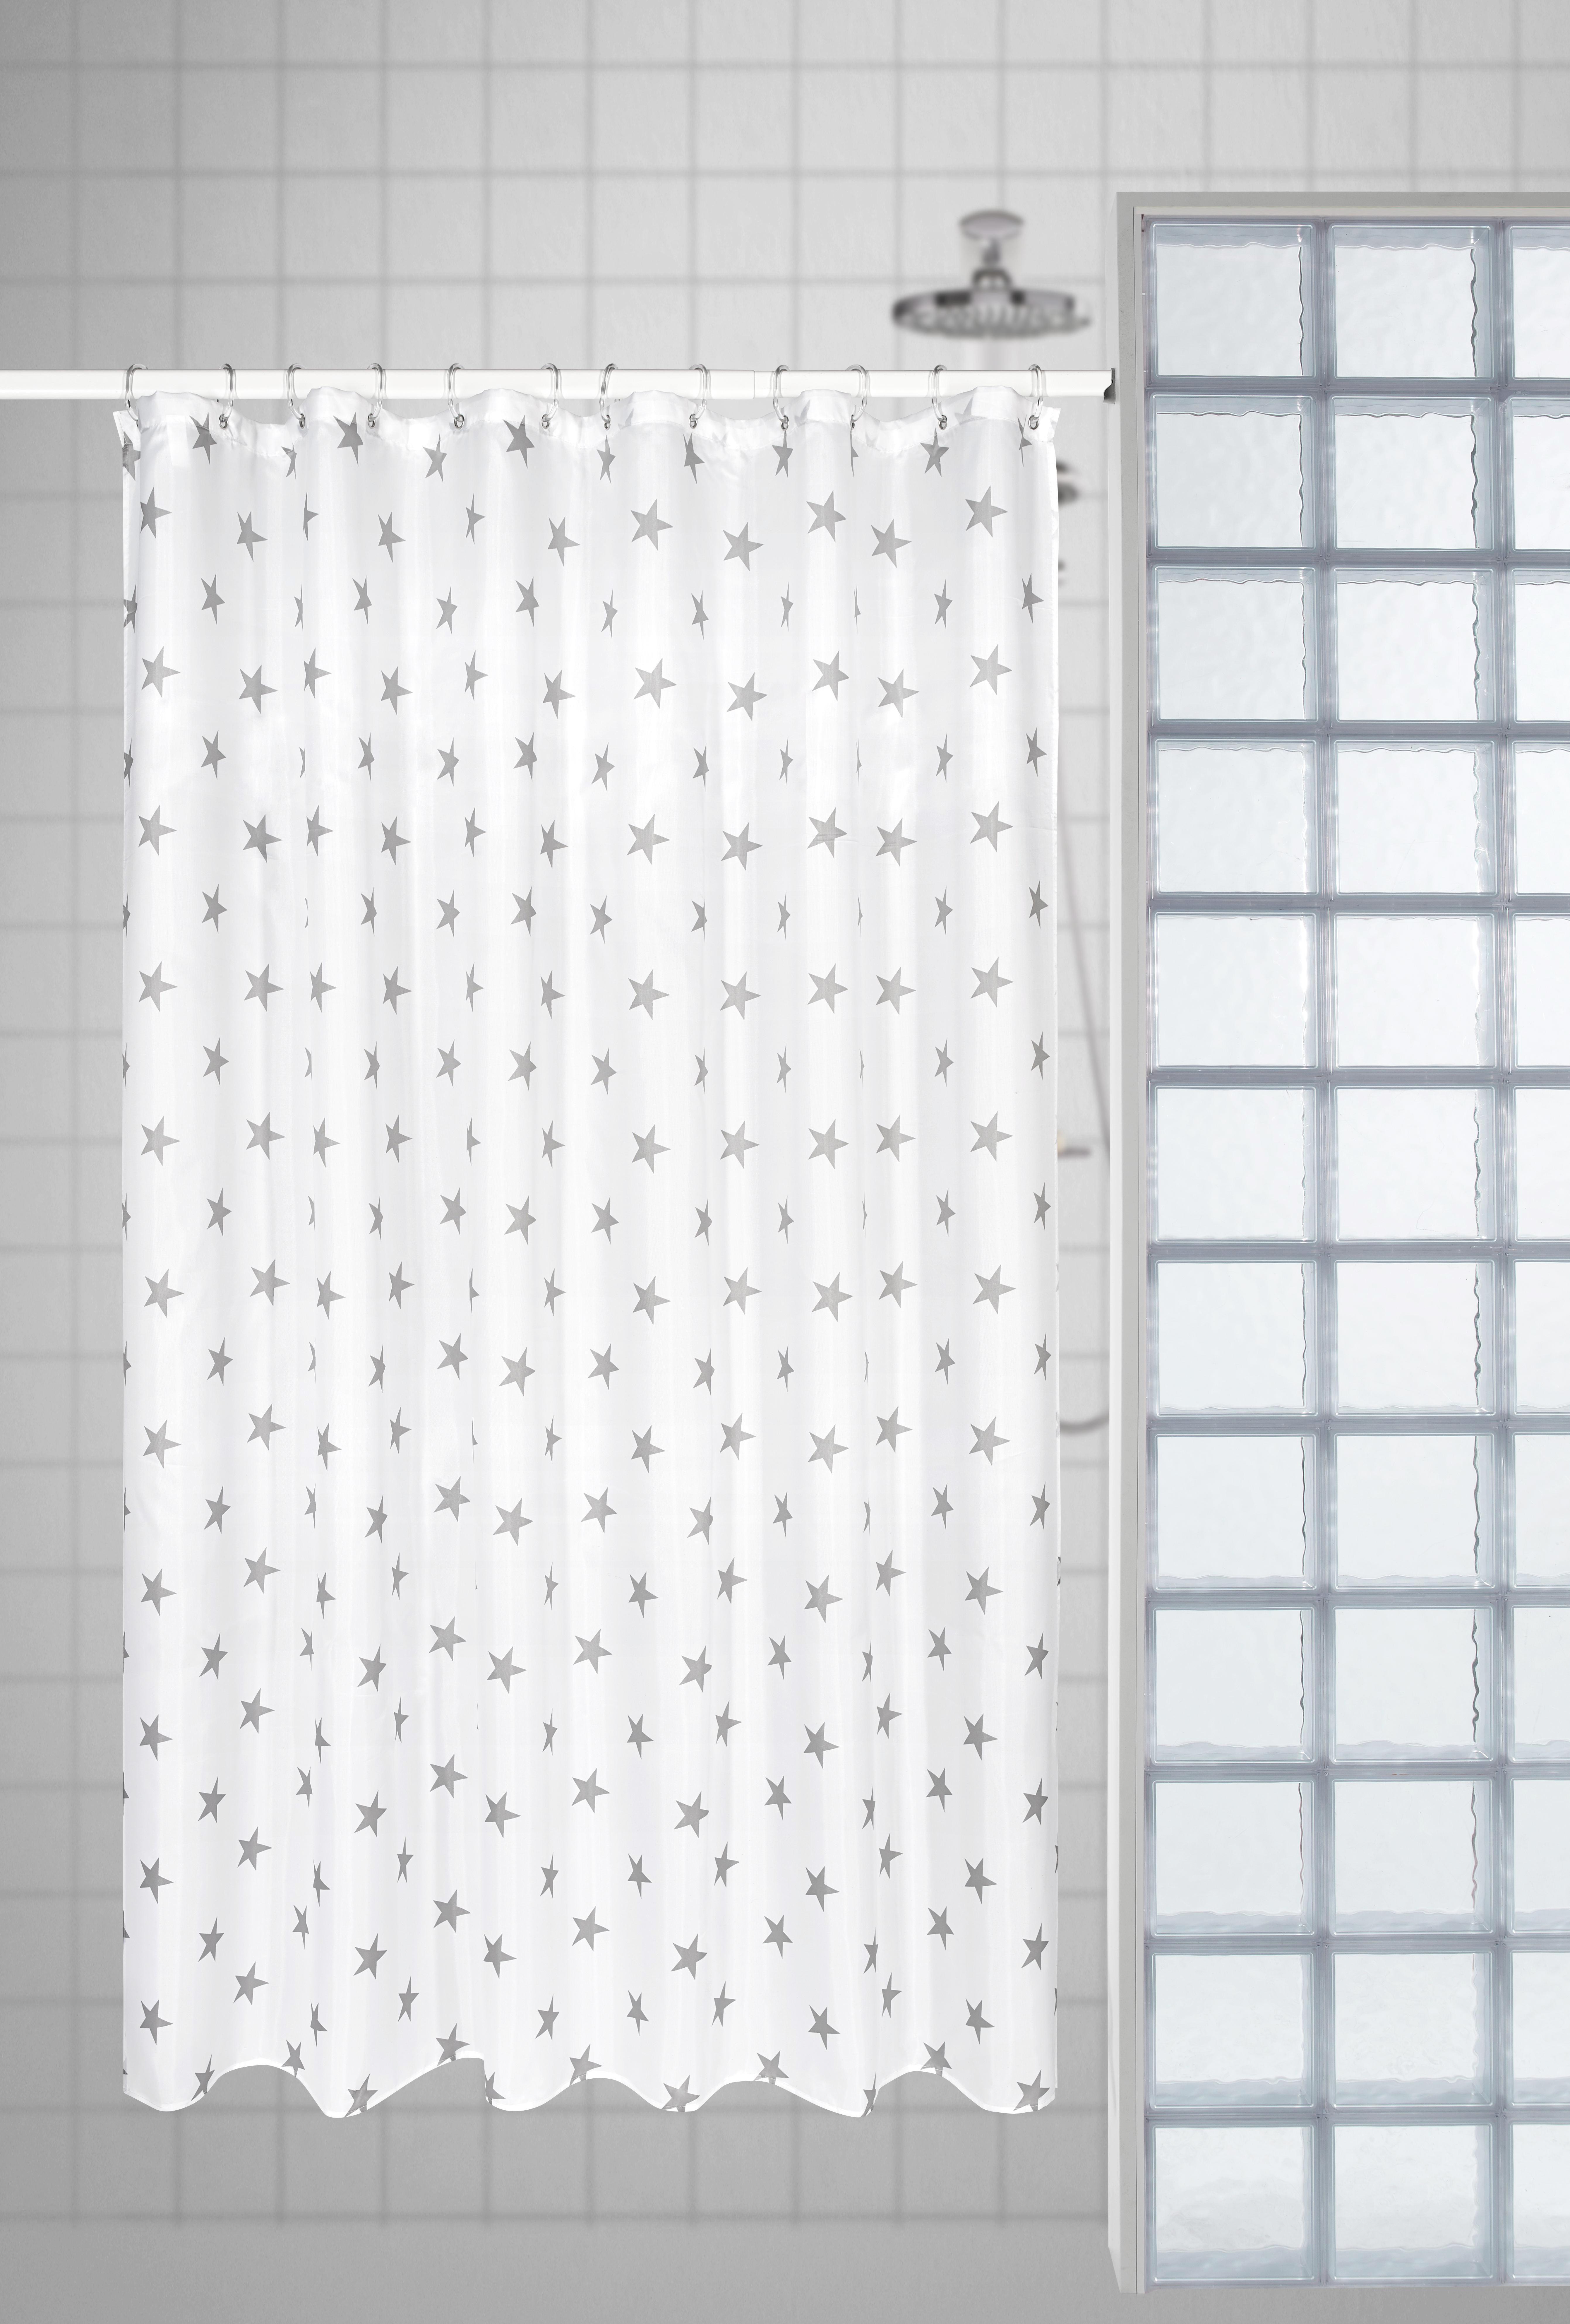 Duschvorhang Sterne,  ca. 180x180cm - Petrol/Weiß (180/180cm) - MÖMAX modern living